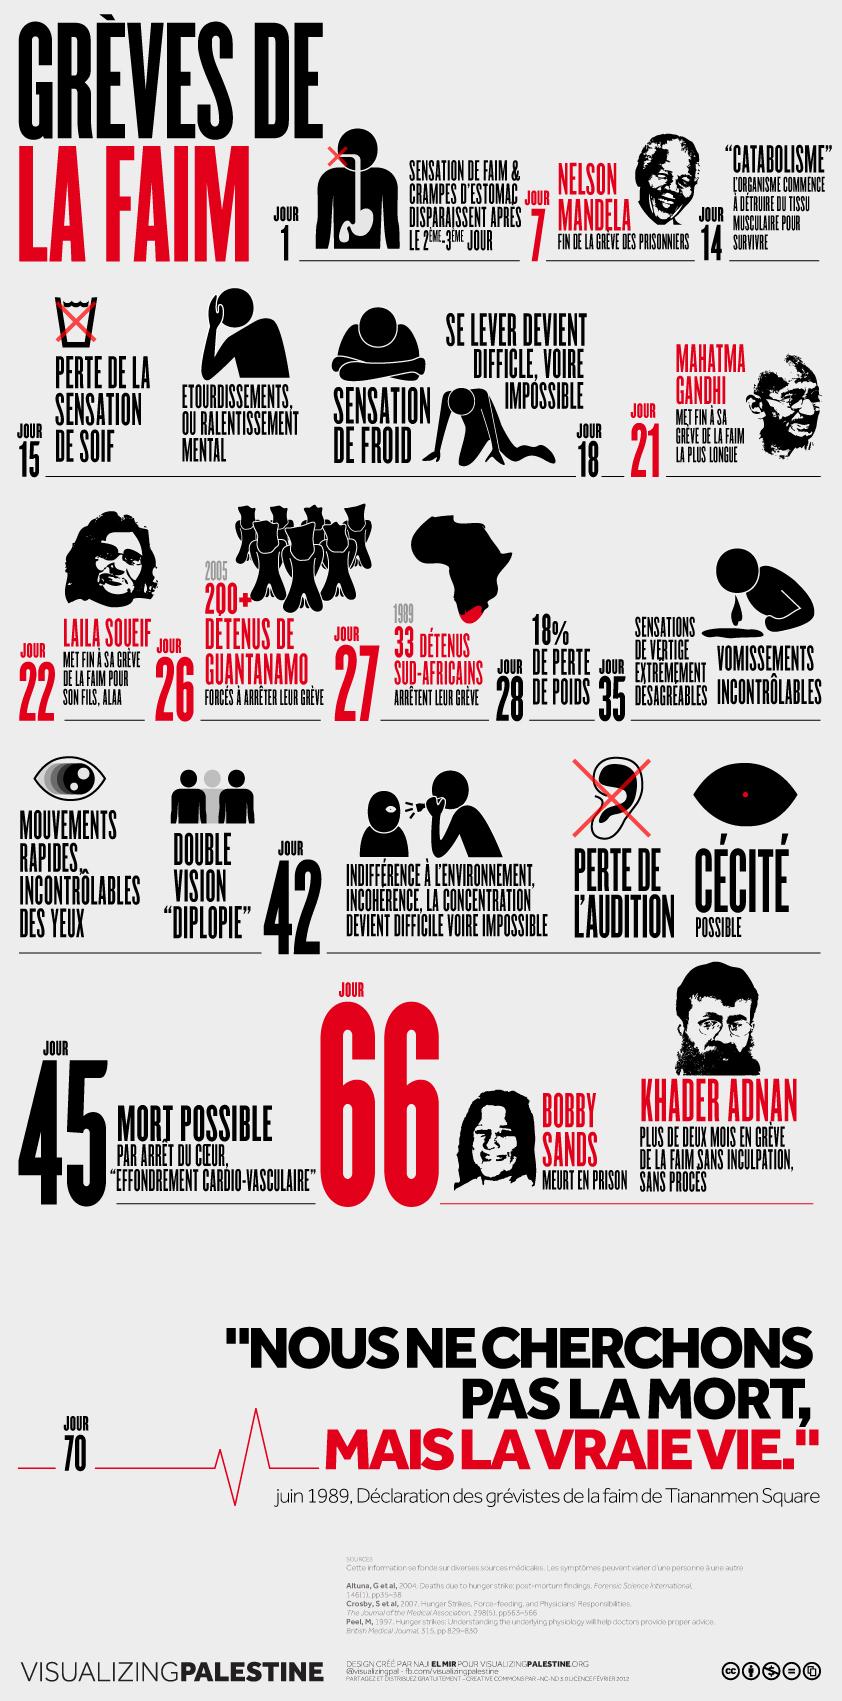 Sur Khader Adnan grève de la faim